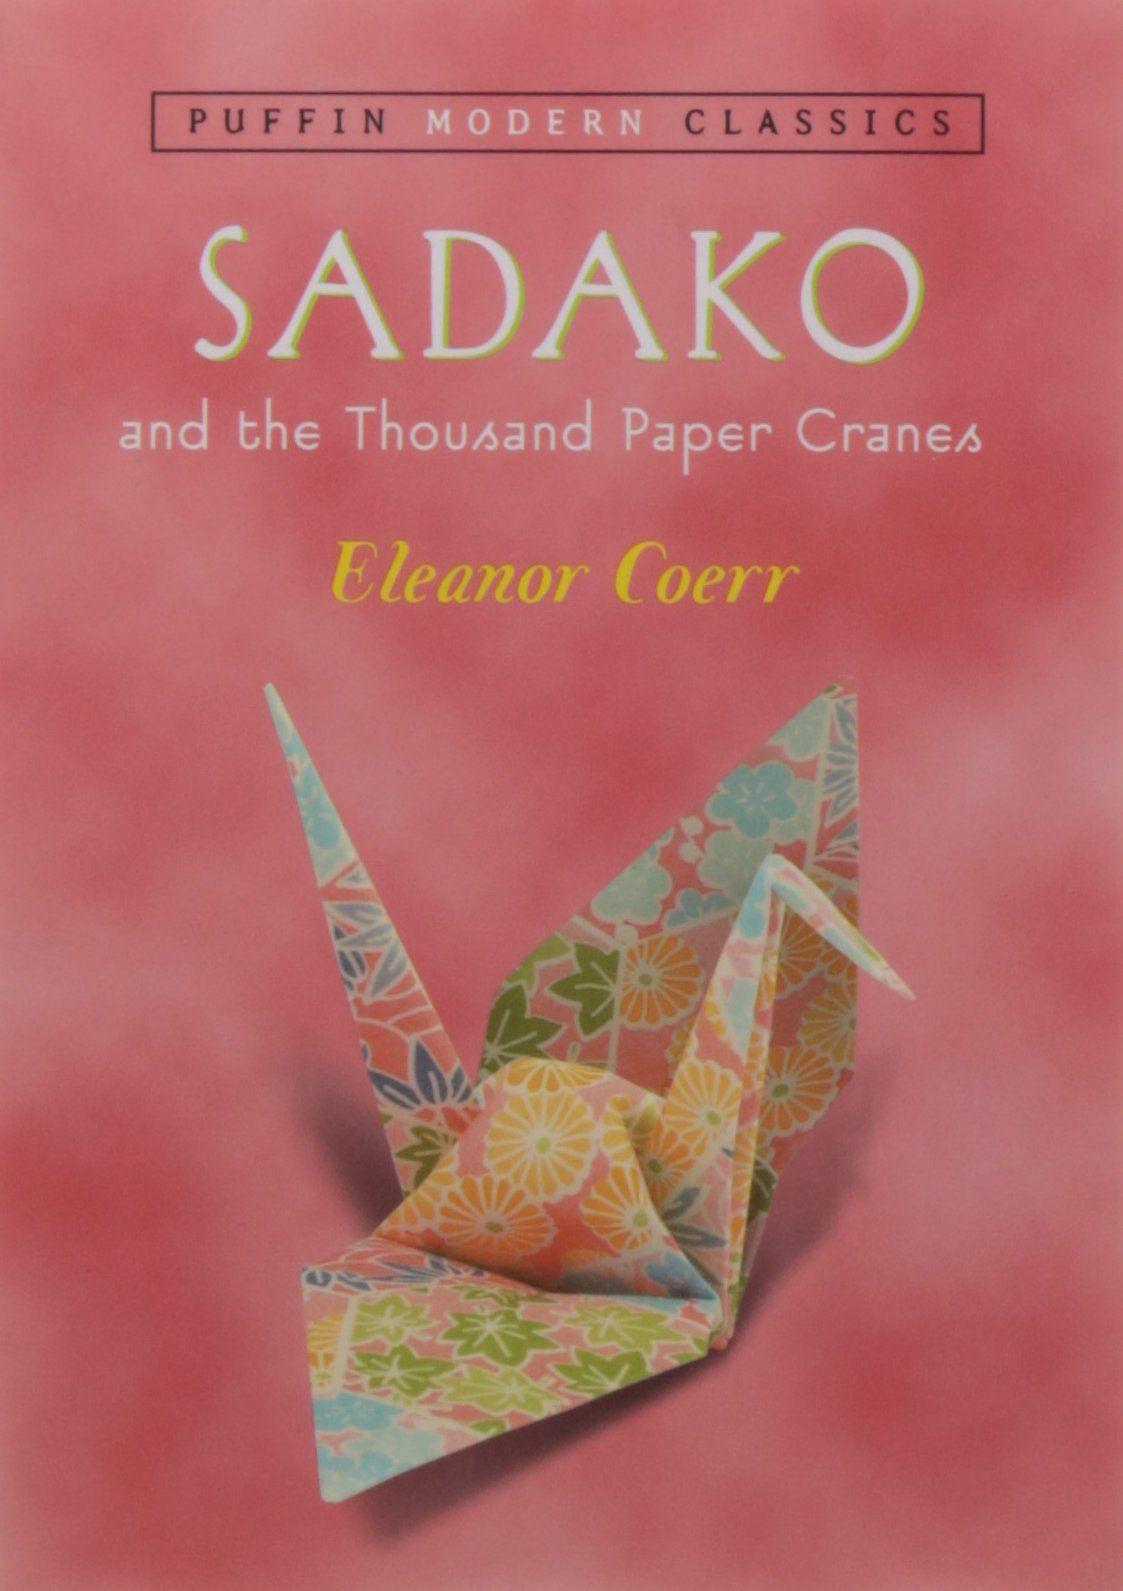 A Guide To Sadako And The Thousand Paper Cranes